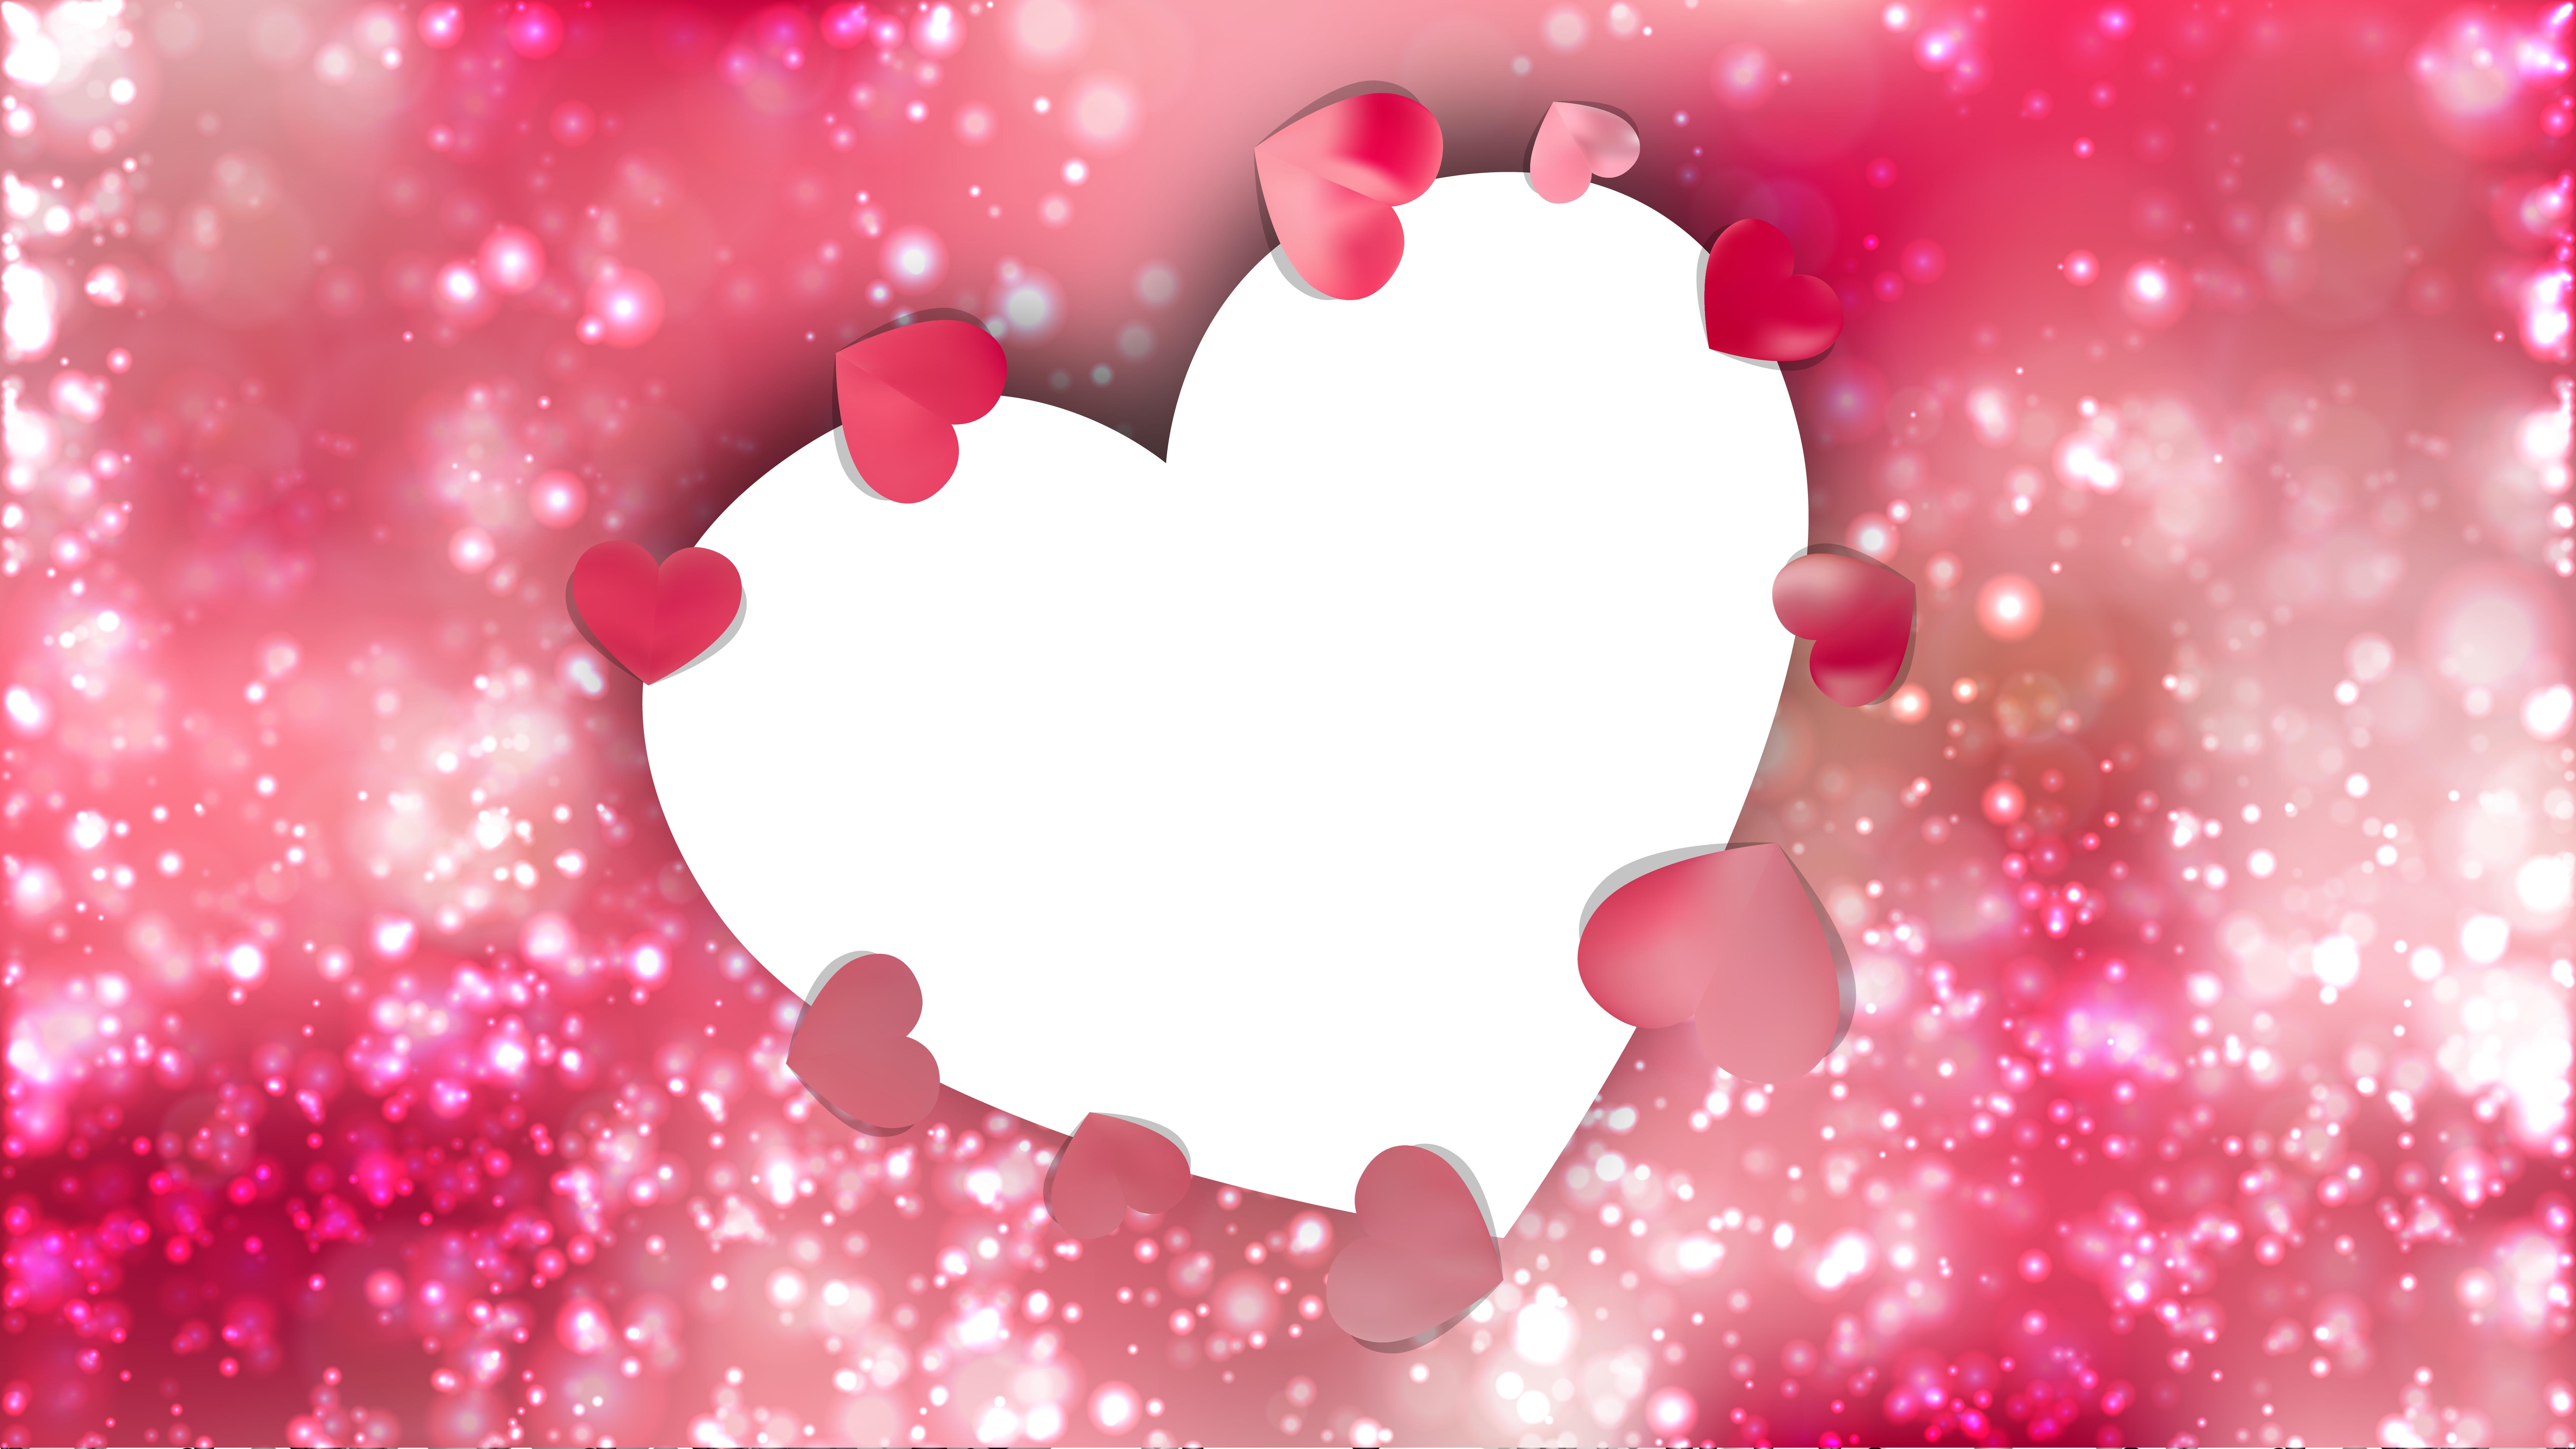 Free Pink Love Background Illustration